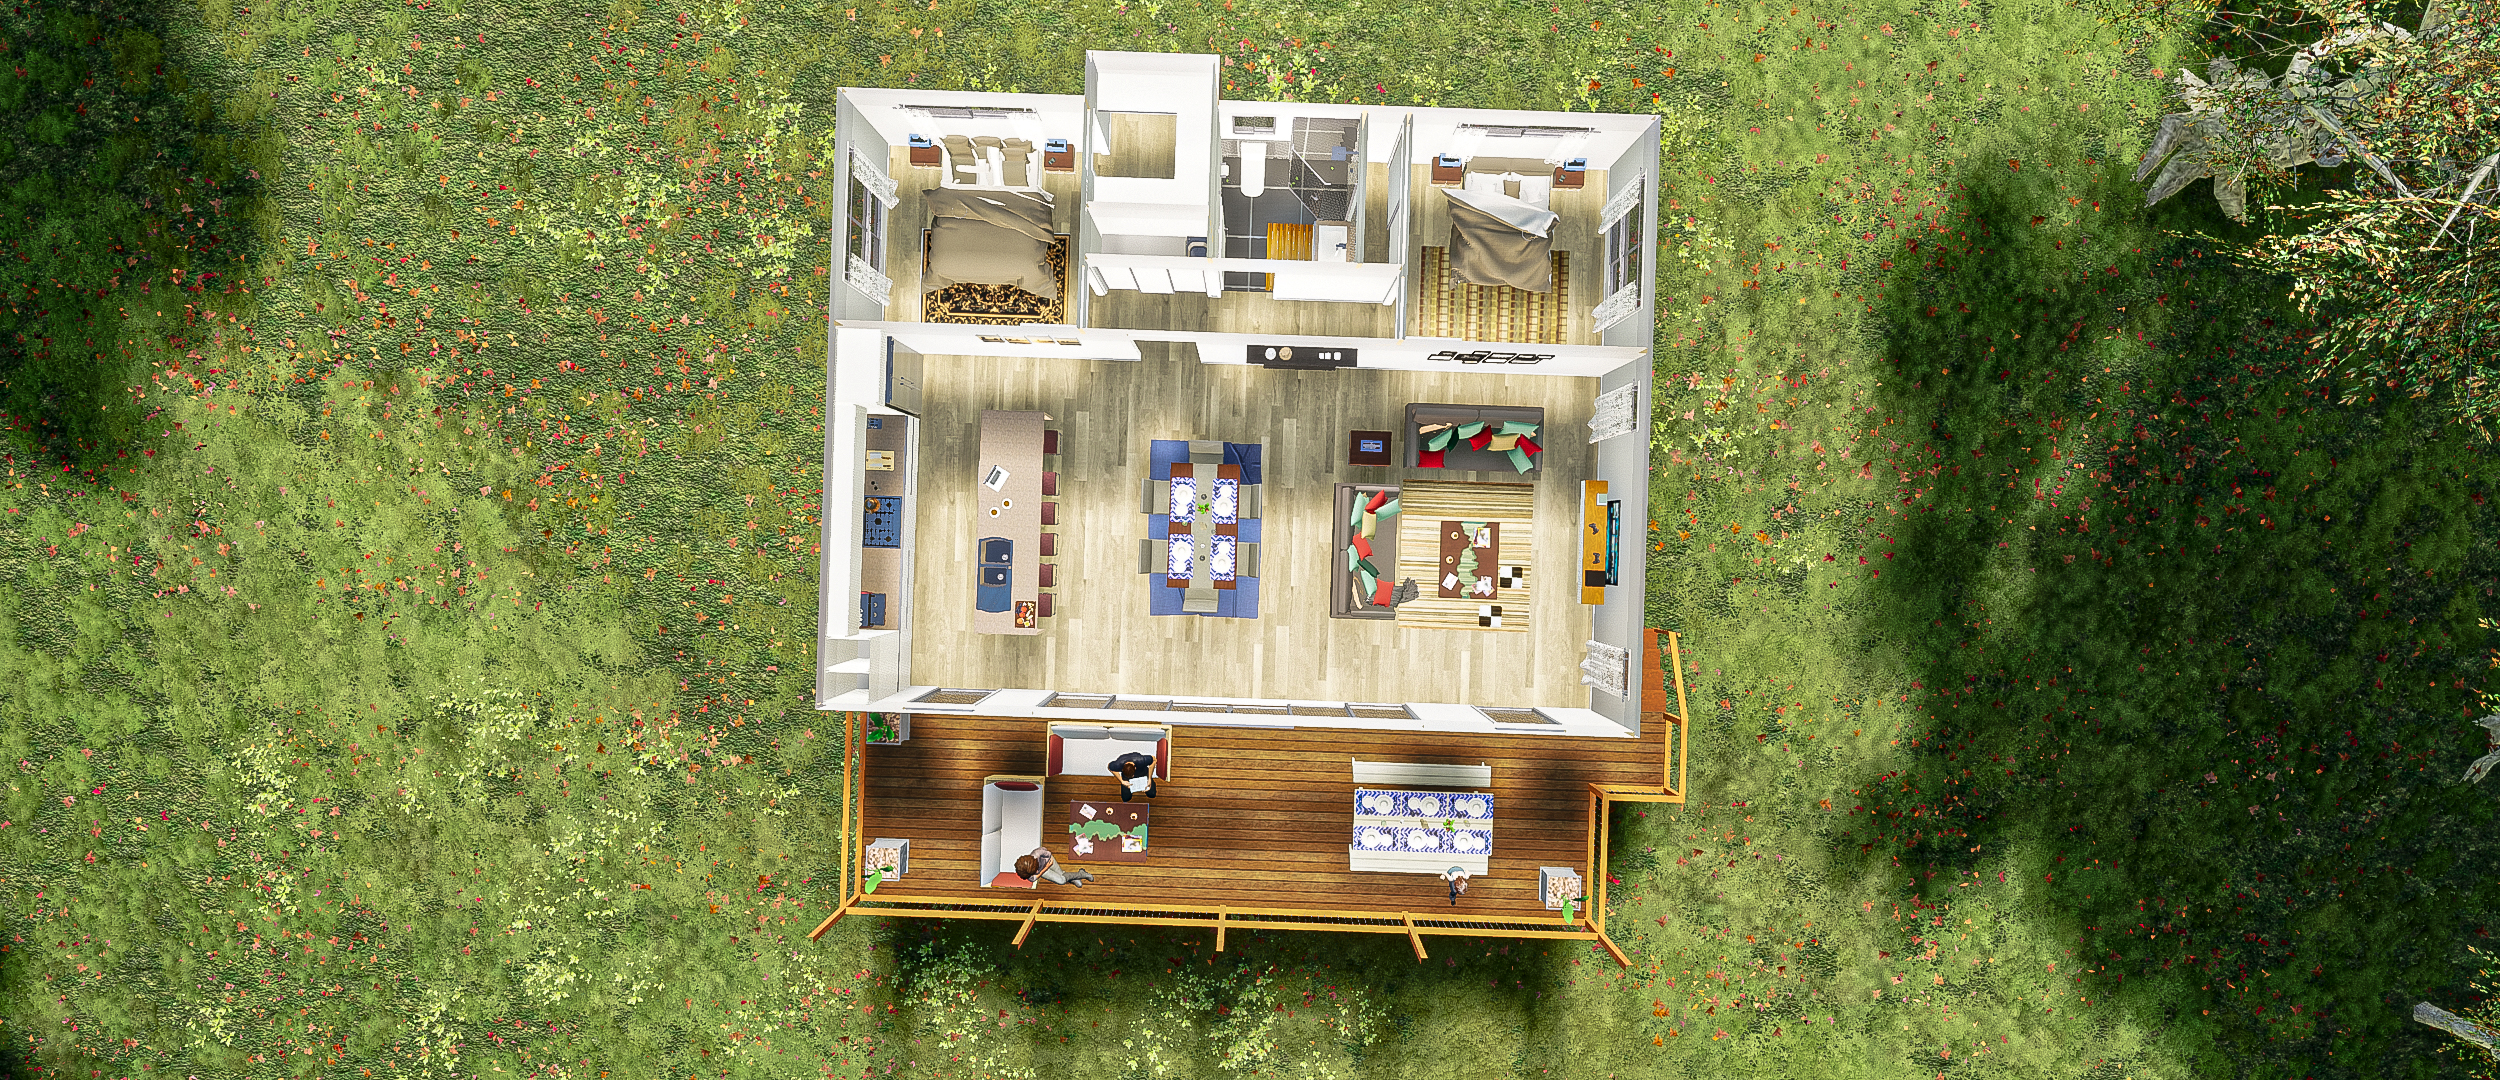 GF 6 Floorplan